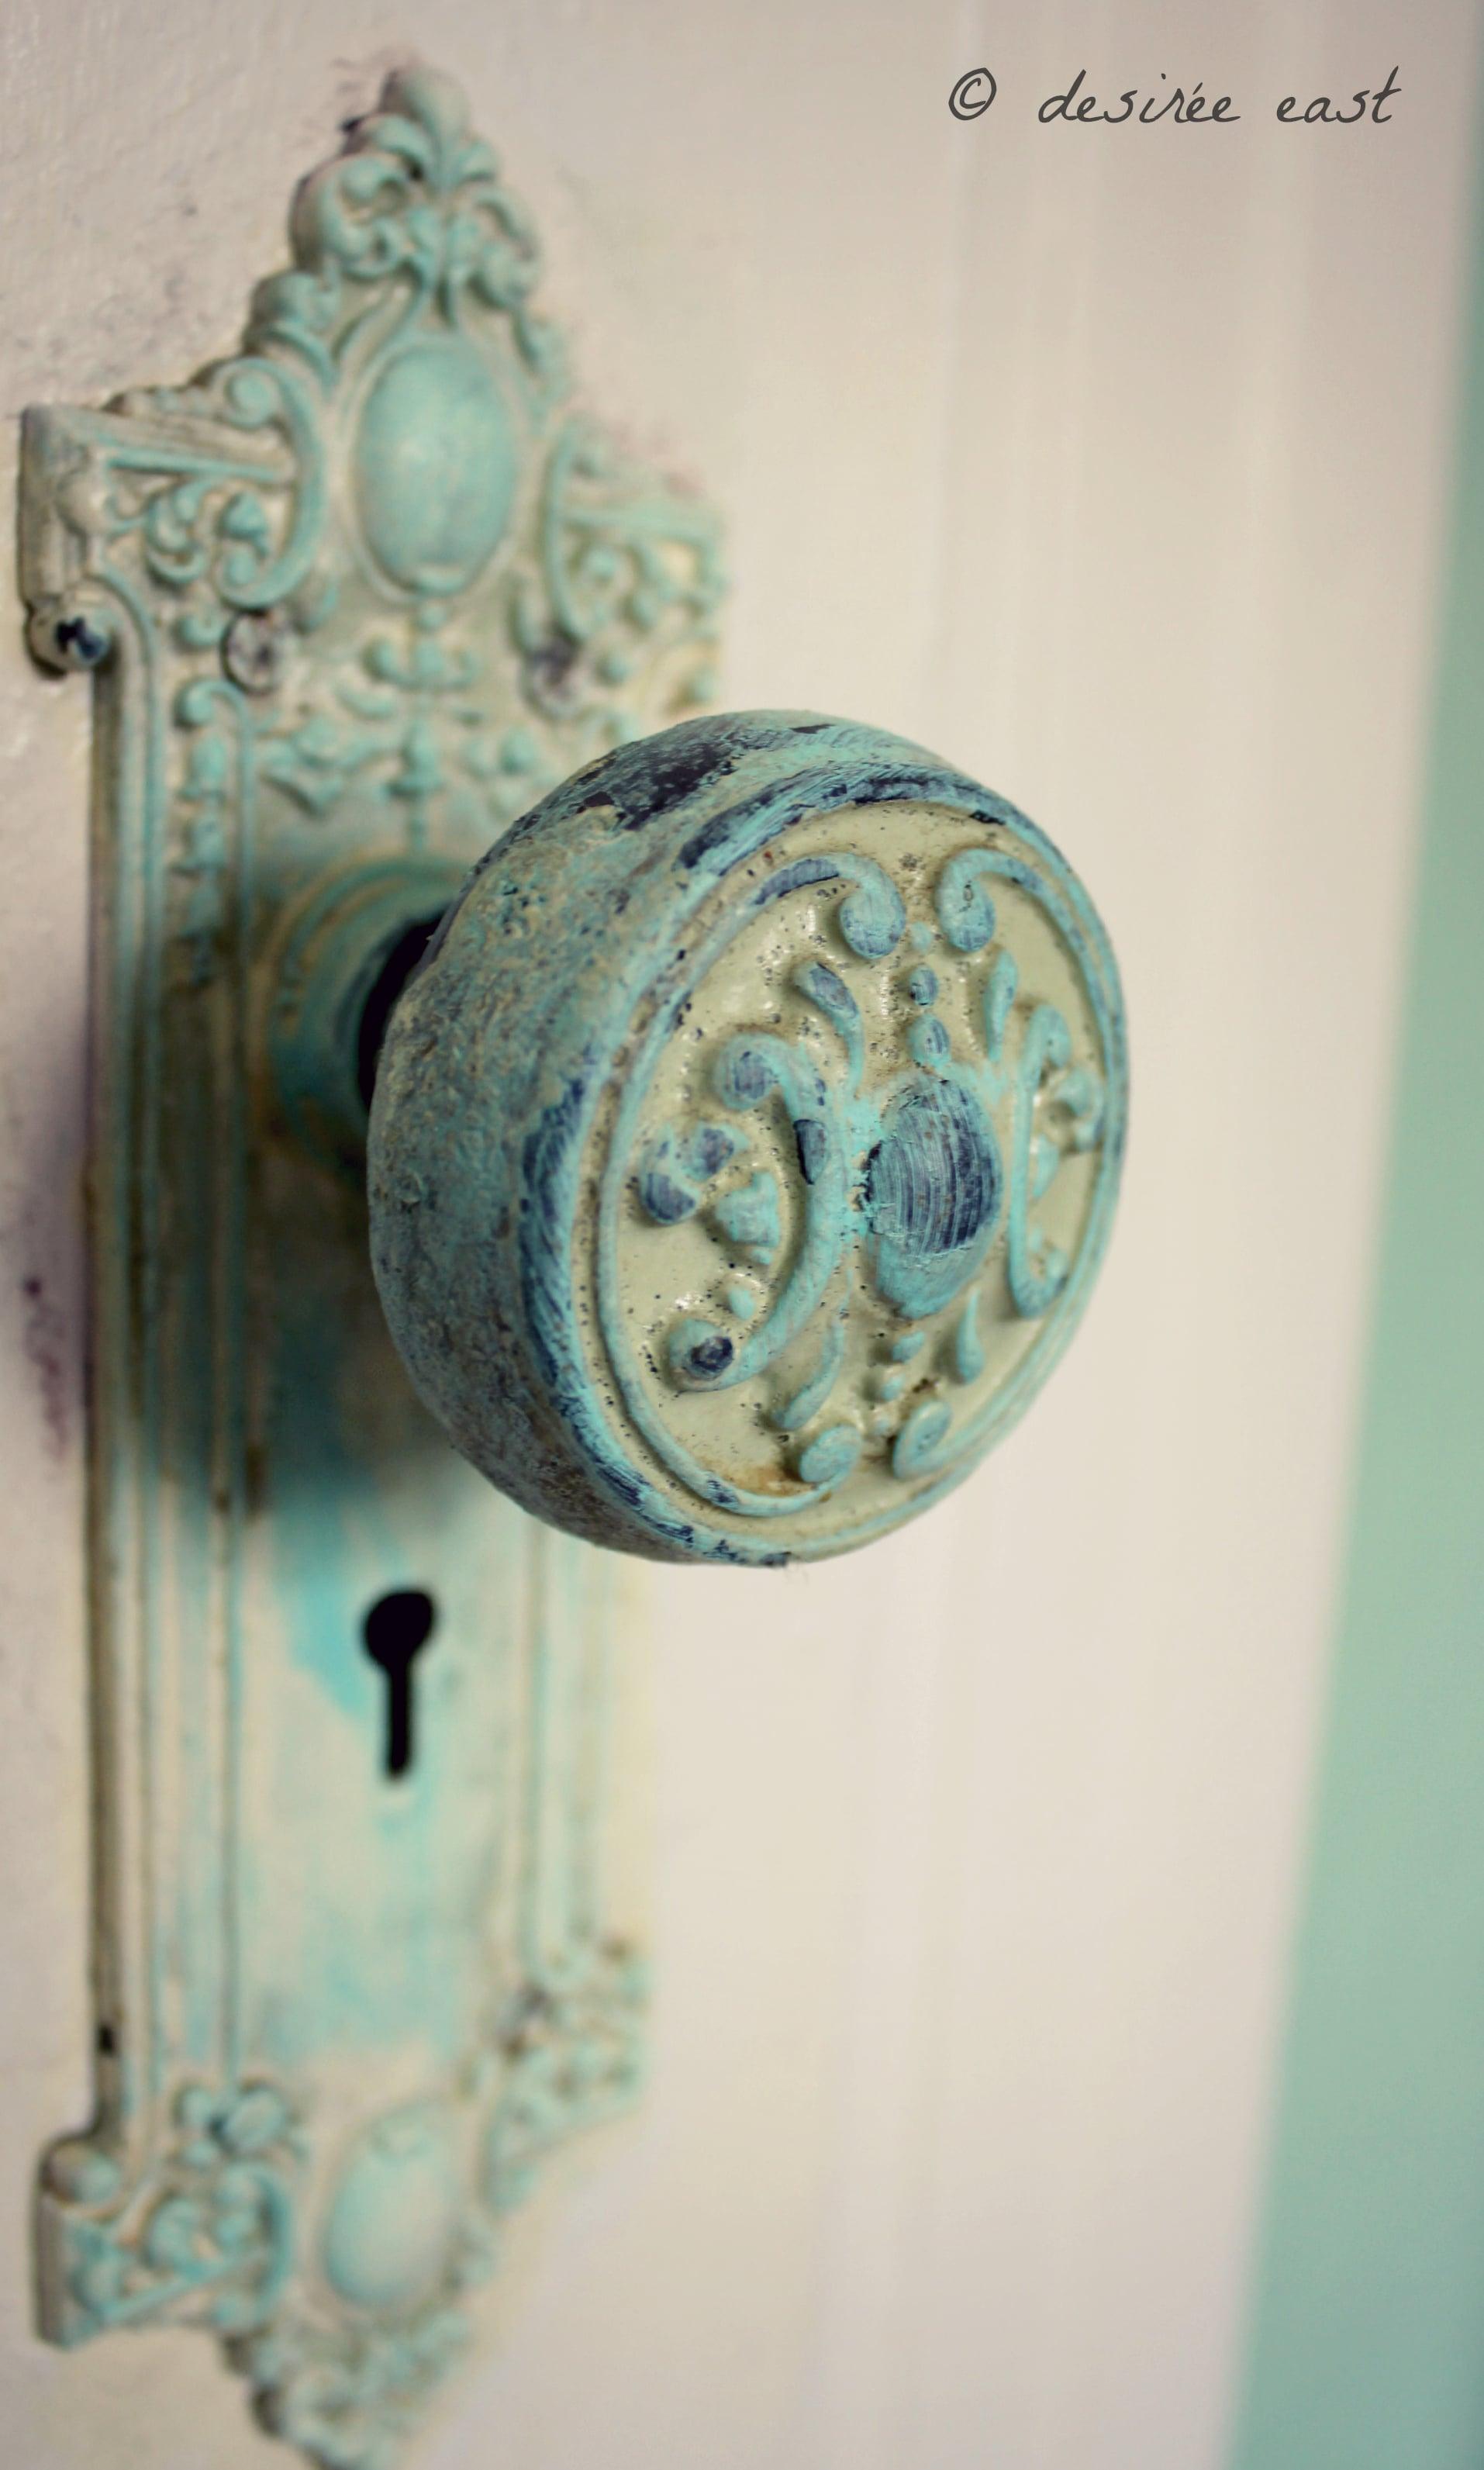 i heart this antique door knob. ventura, california. photo by desiree east